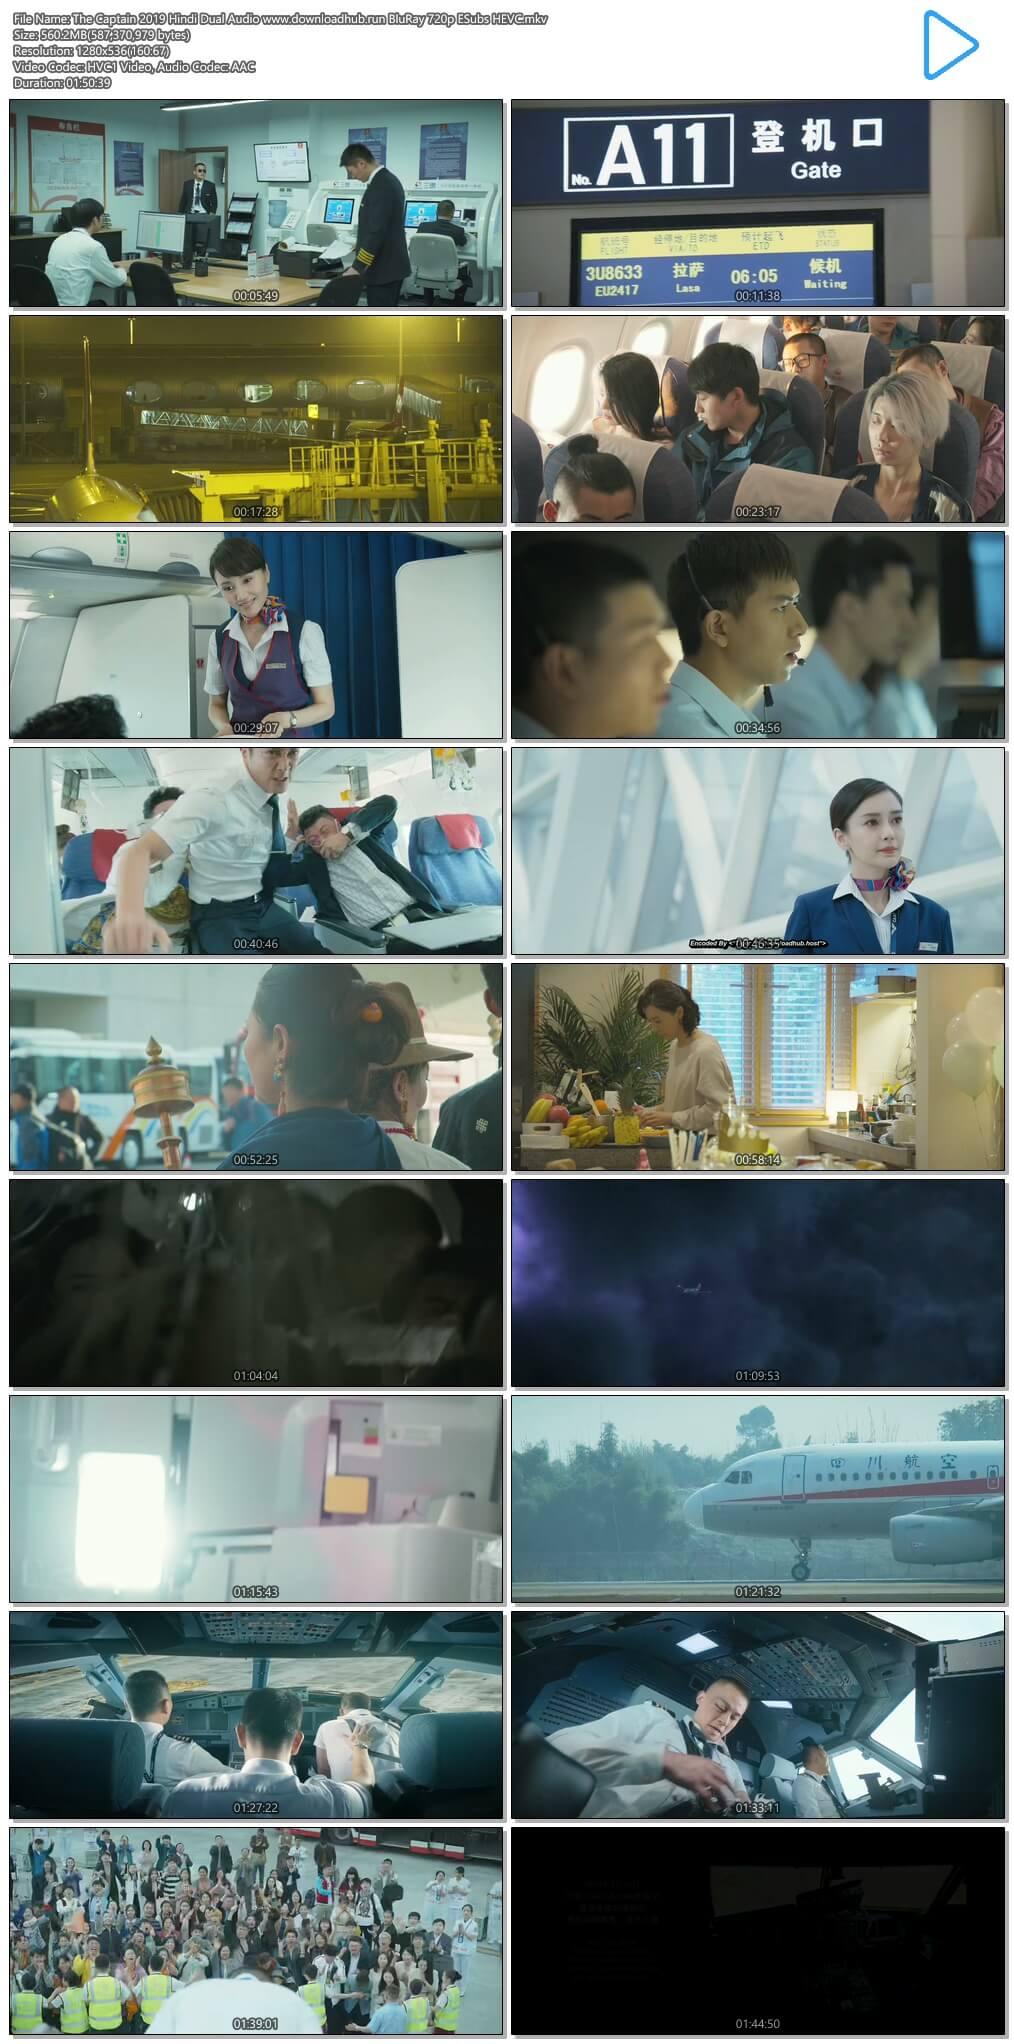 The Captain 2019 Hindi Dual Audio 550MB BluRay 720p ESubs HEVC